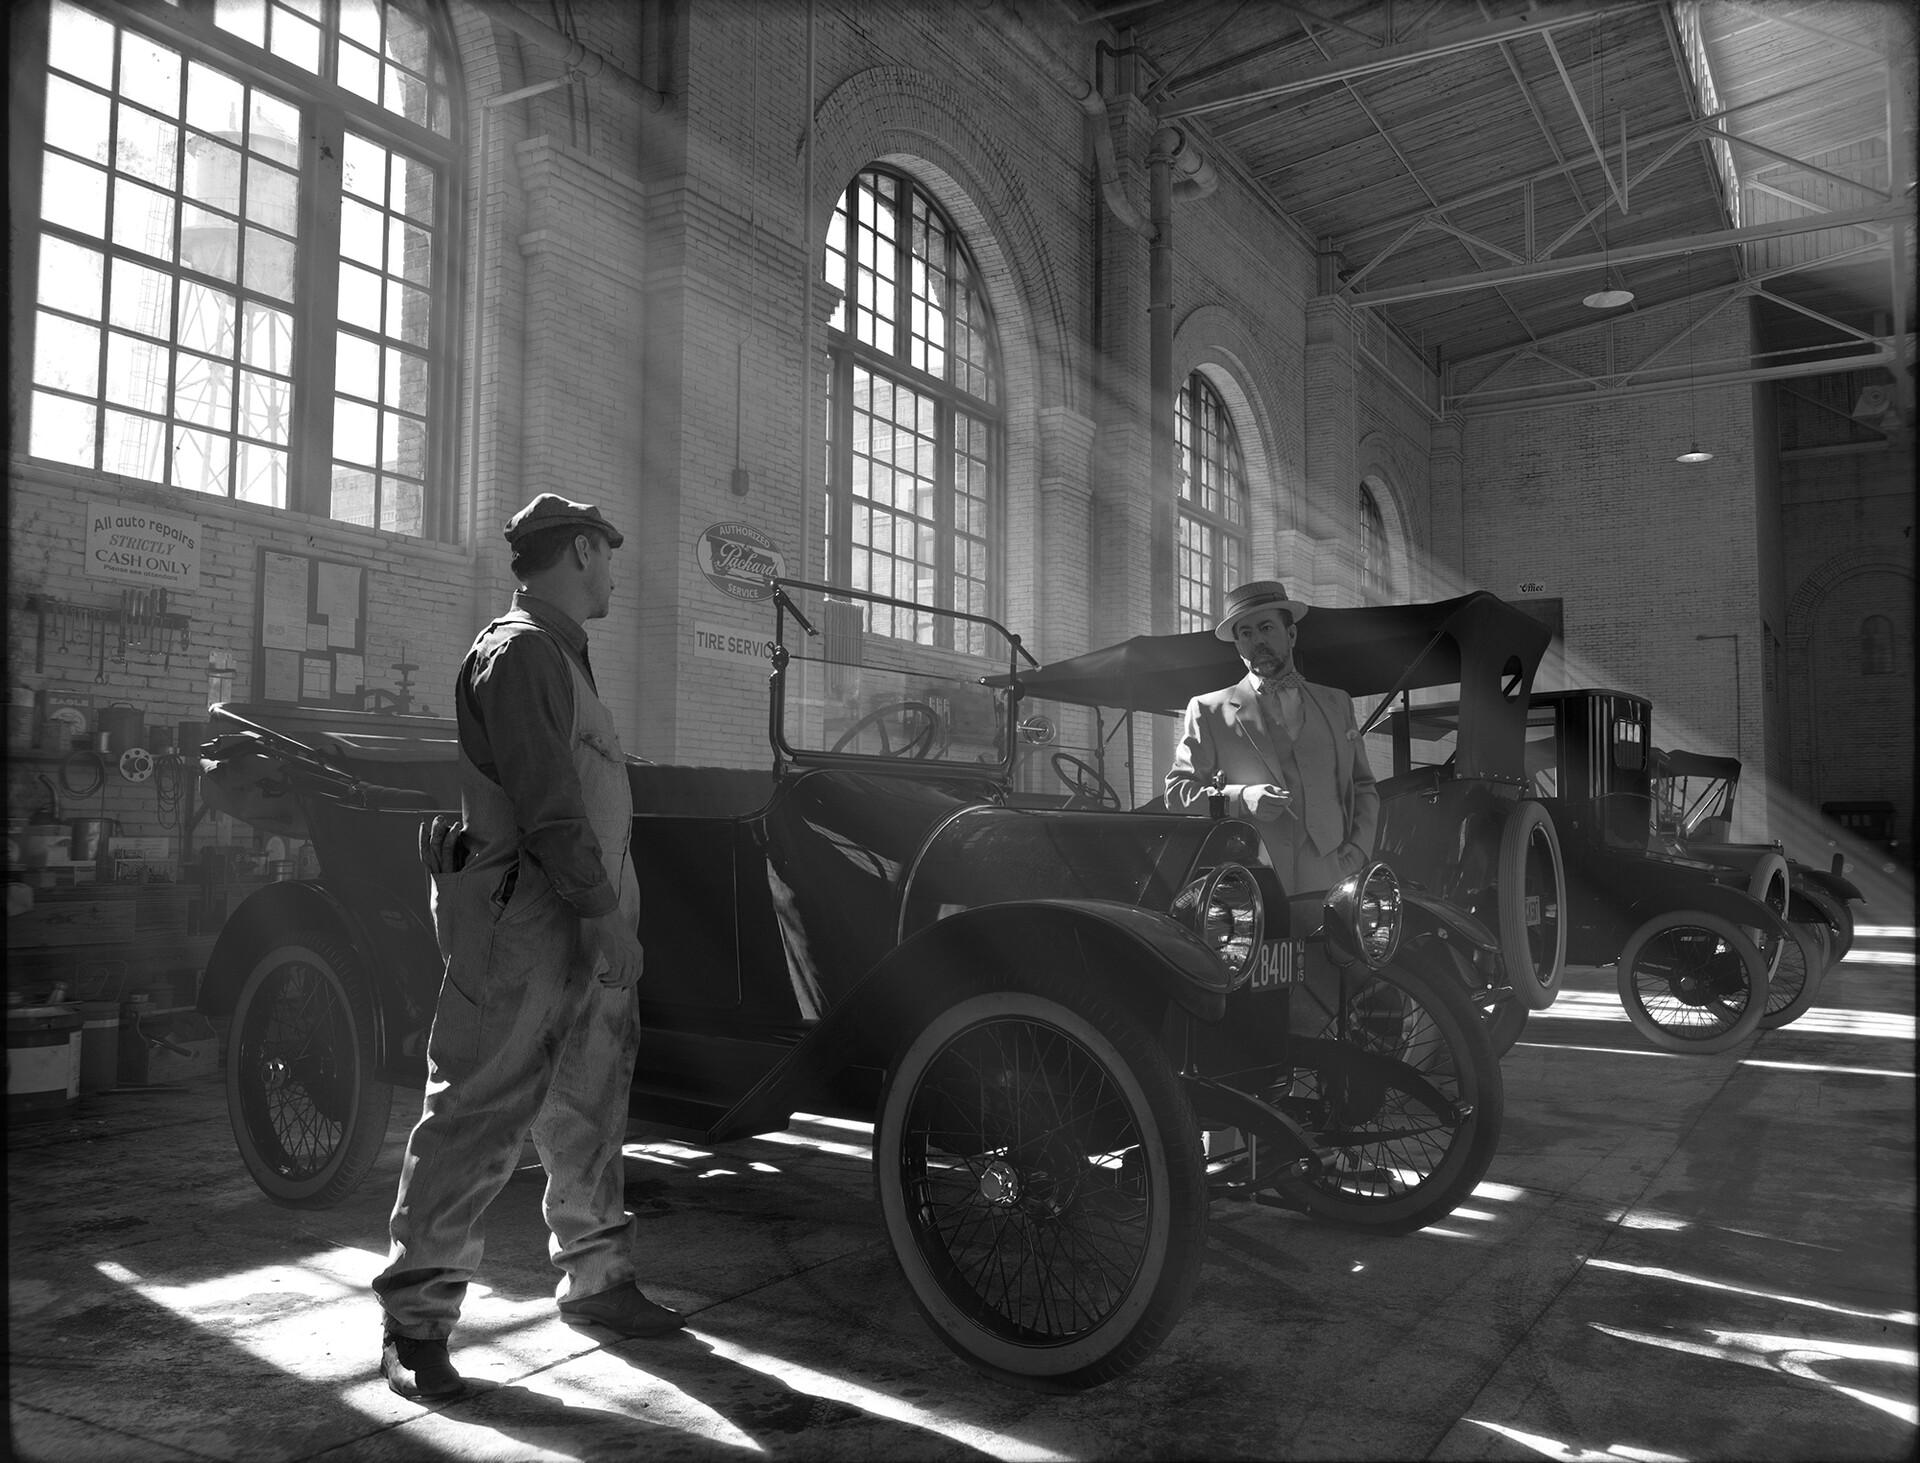 Rodolfo damaggio nj 1915 2k bwartstation